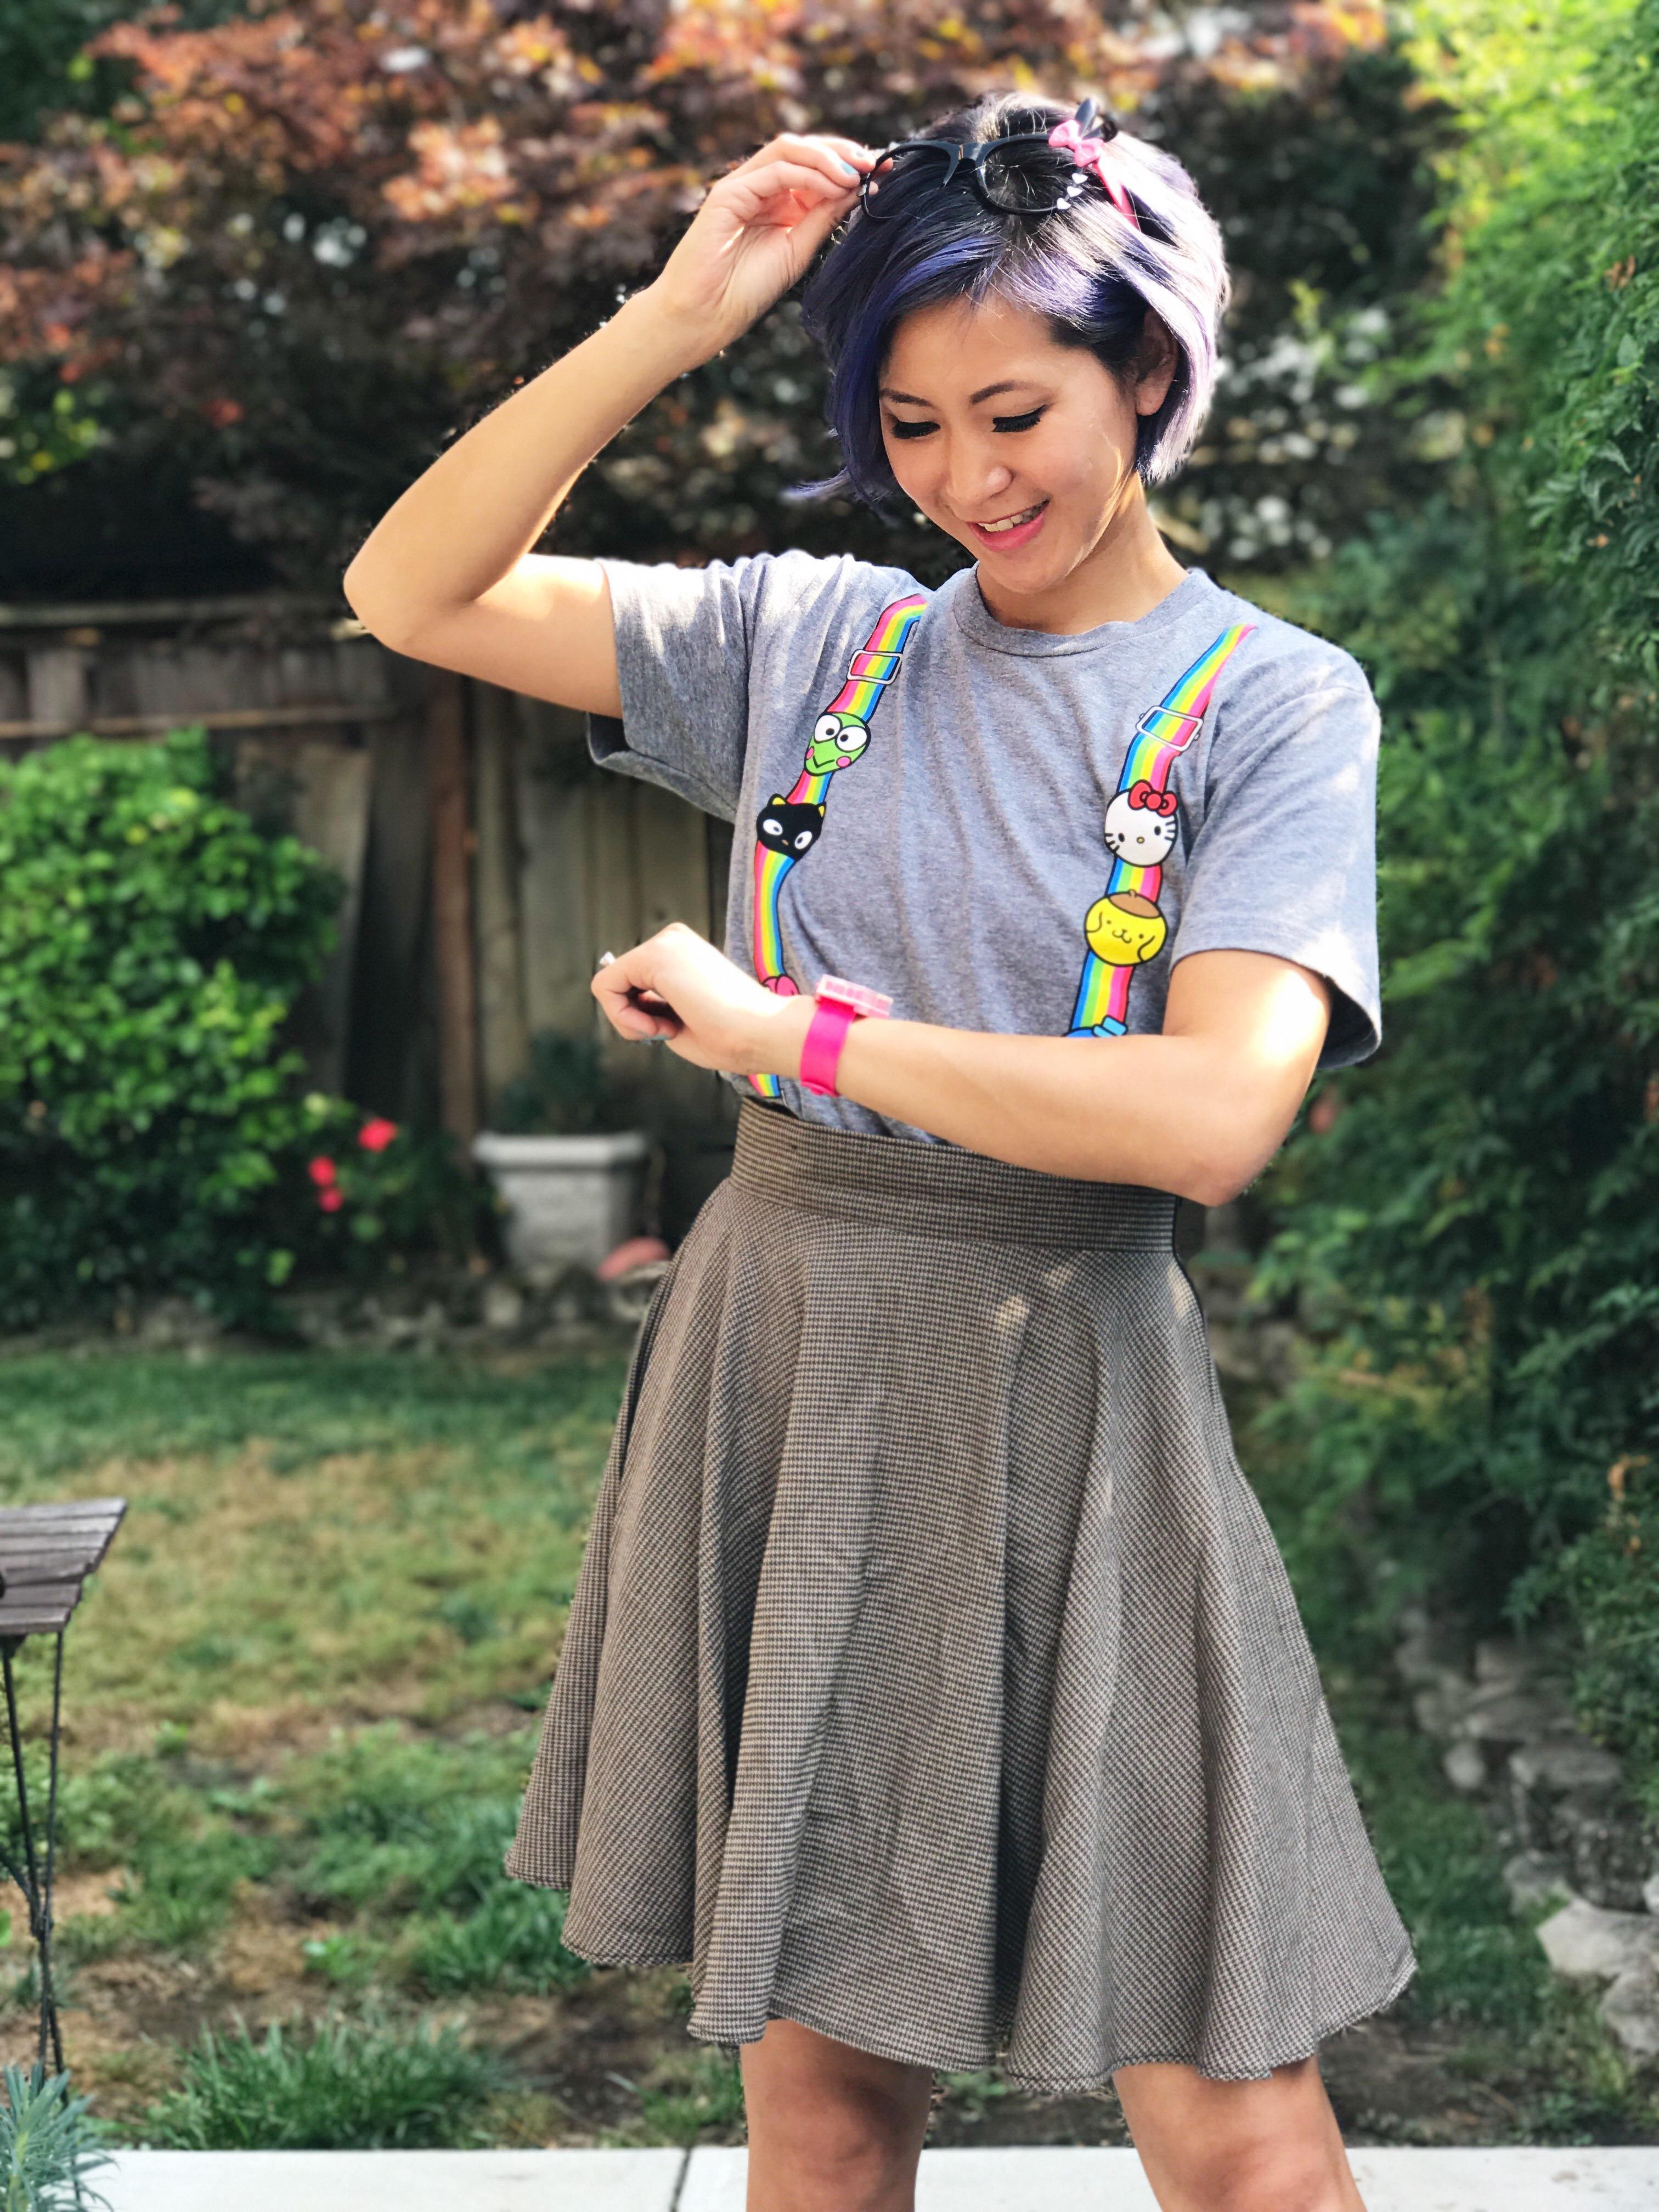 Cute Geeky Sanrio Nerdy Outfit